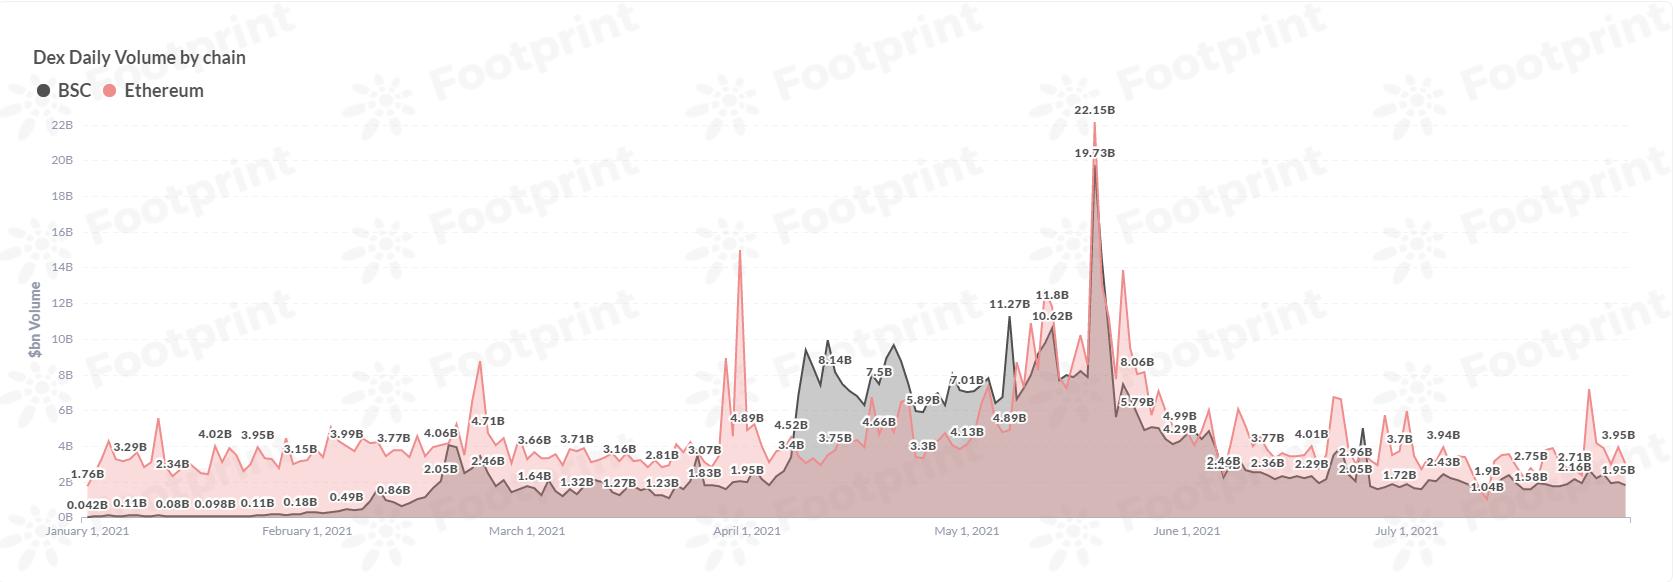 Dex cross-chain daily transaction volume (since January 2021) Data source: Footprint